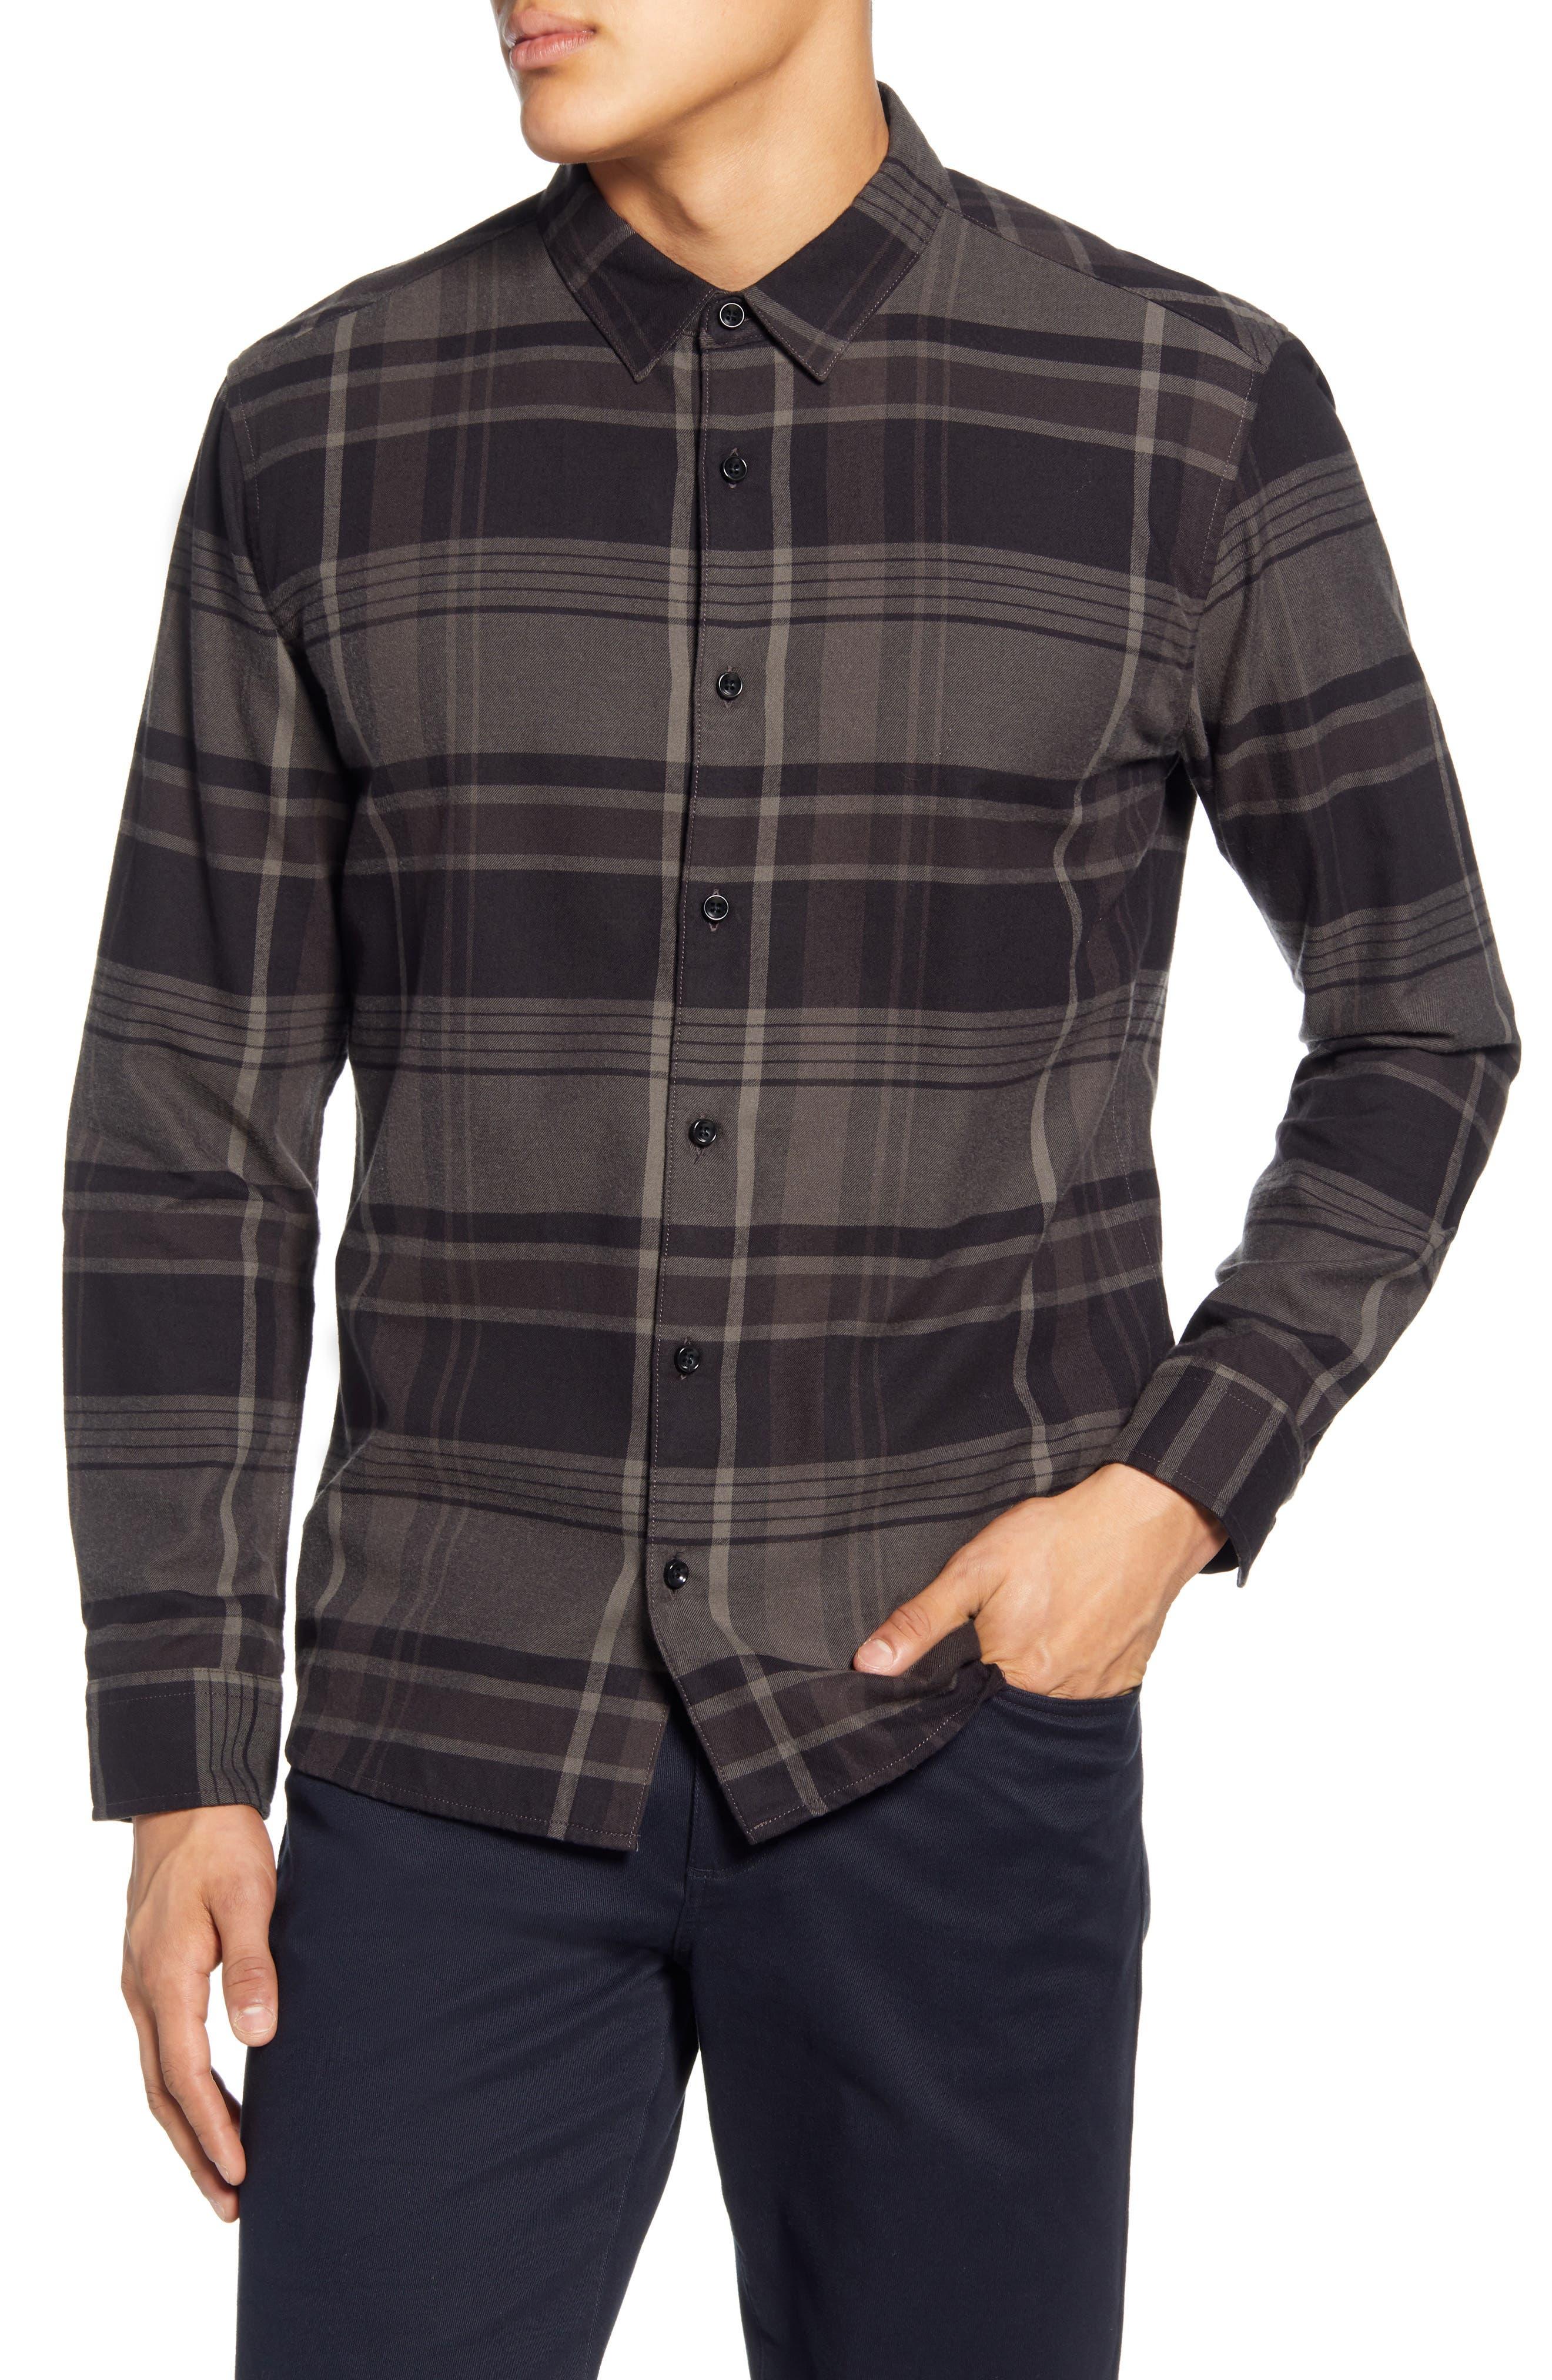 Image of BALDWIN Arias Slim Fit Plaid Button-Up Shirt